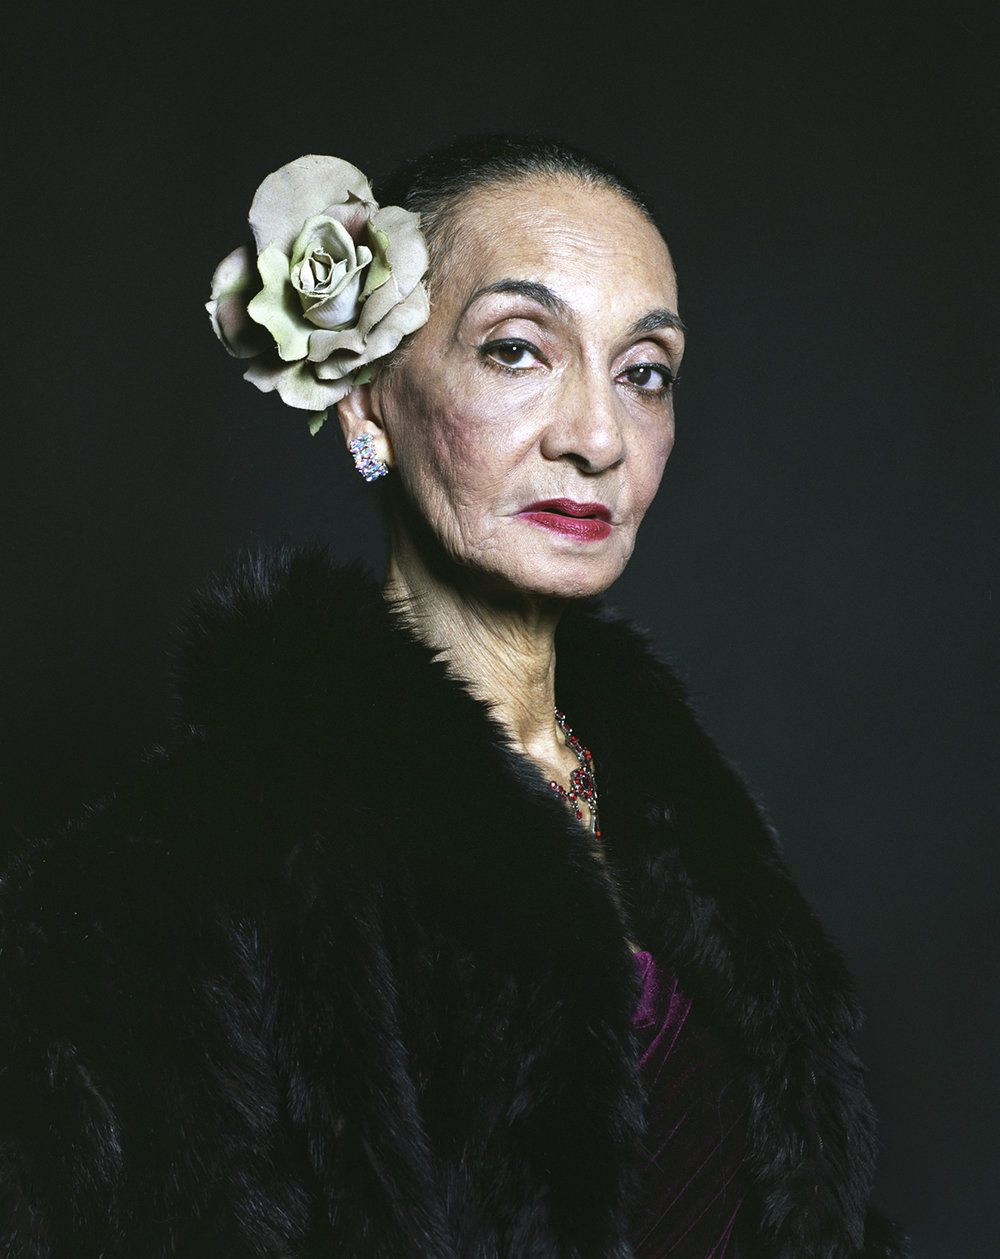 Jacqueline Murdock, 1930-2018